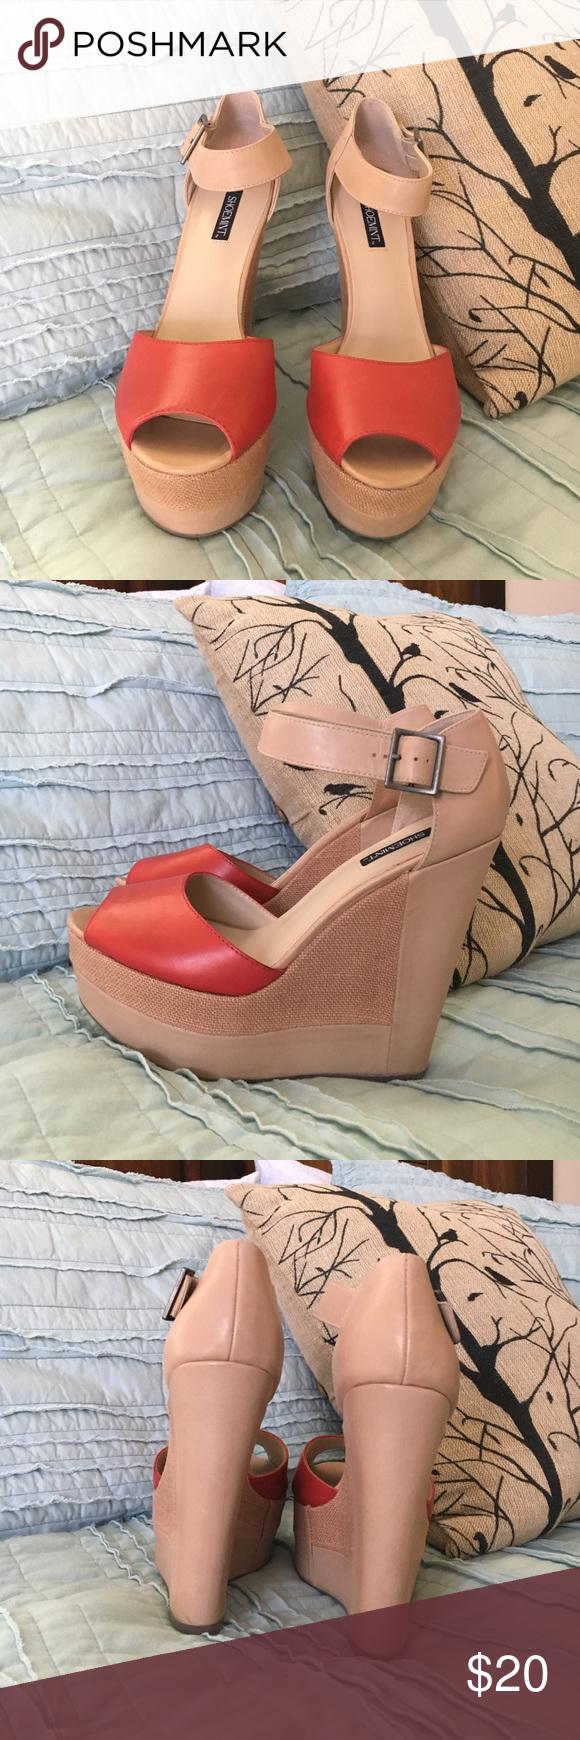 Shoemint Sophia Wedges in Bone/Red Shoemint Sophia Wedges in Bone/Red. Some signs of wear; otherwise in great condition! Shoemint Shoes Wedges